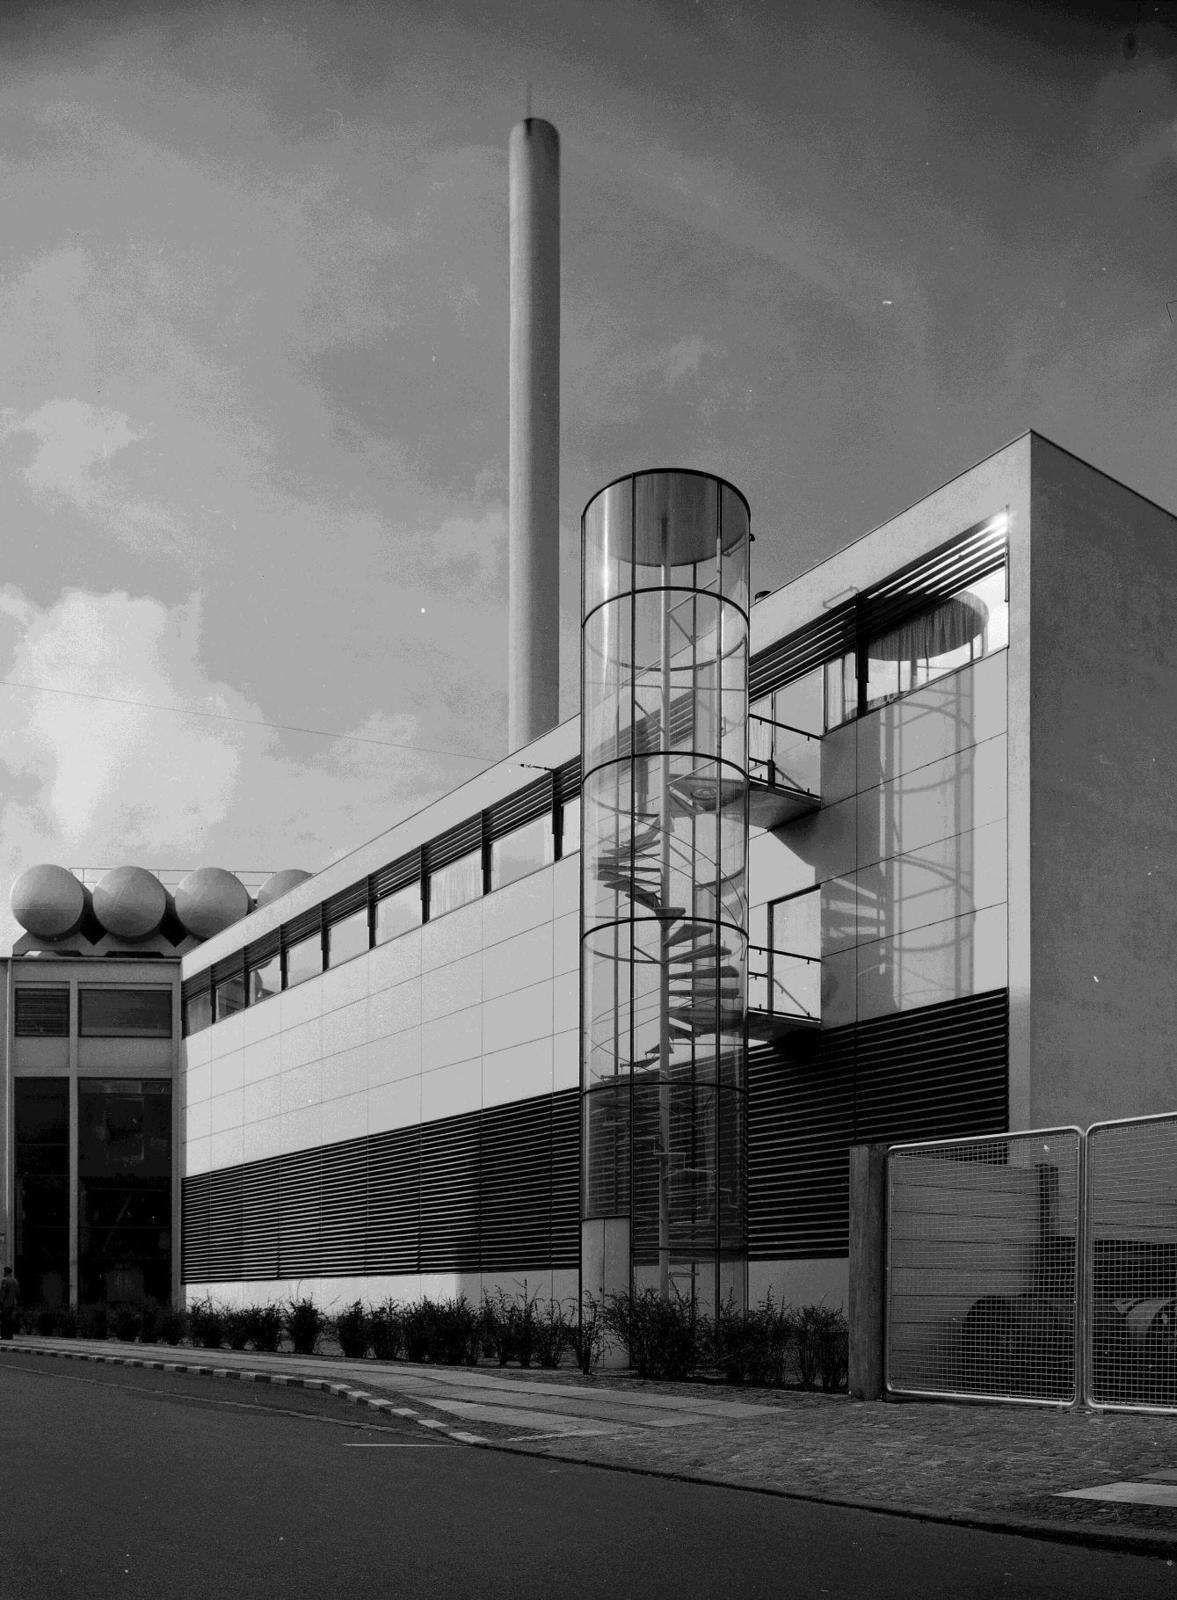 Arne jacobsen novo fabrikkerne ndr fasanvej architecture midcenturymodern architecture - Beruhmte architektur ...